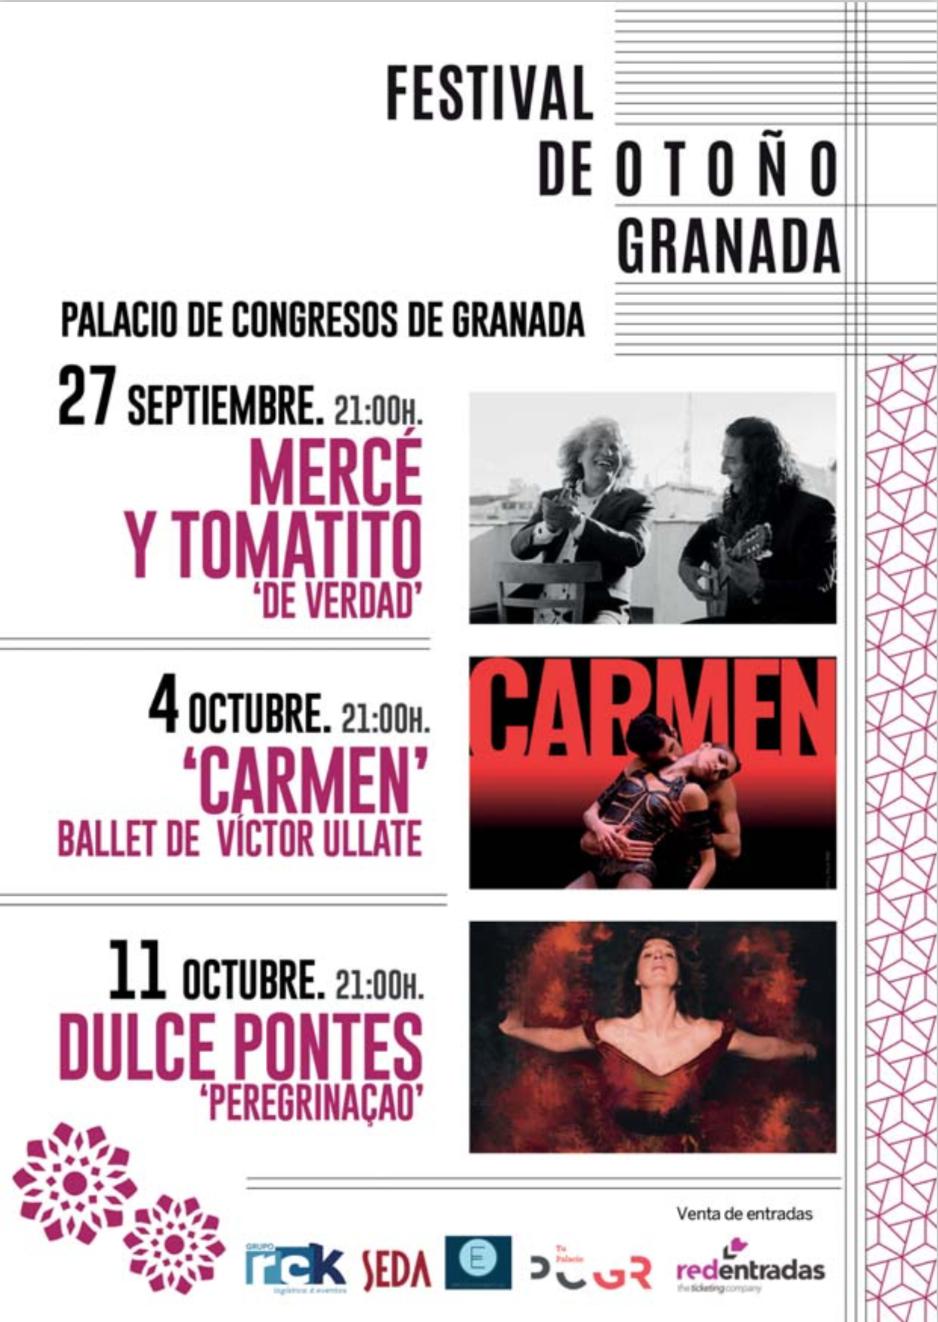 Nace el I Festival de Otoño de Granada